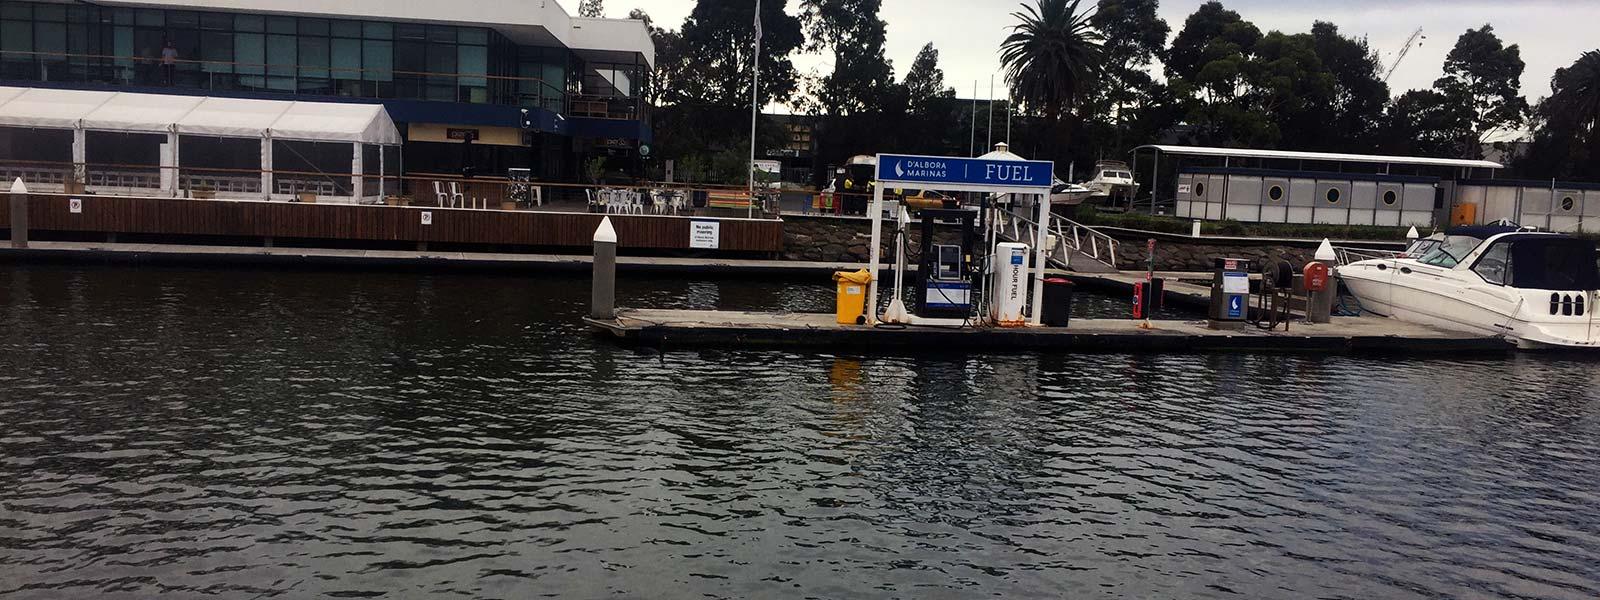 Marine Fuel Docks | Port Phillip Bay & Western Port | RACV